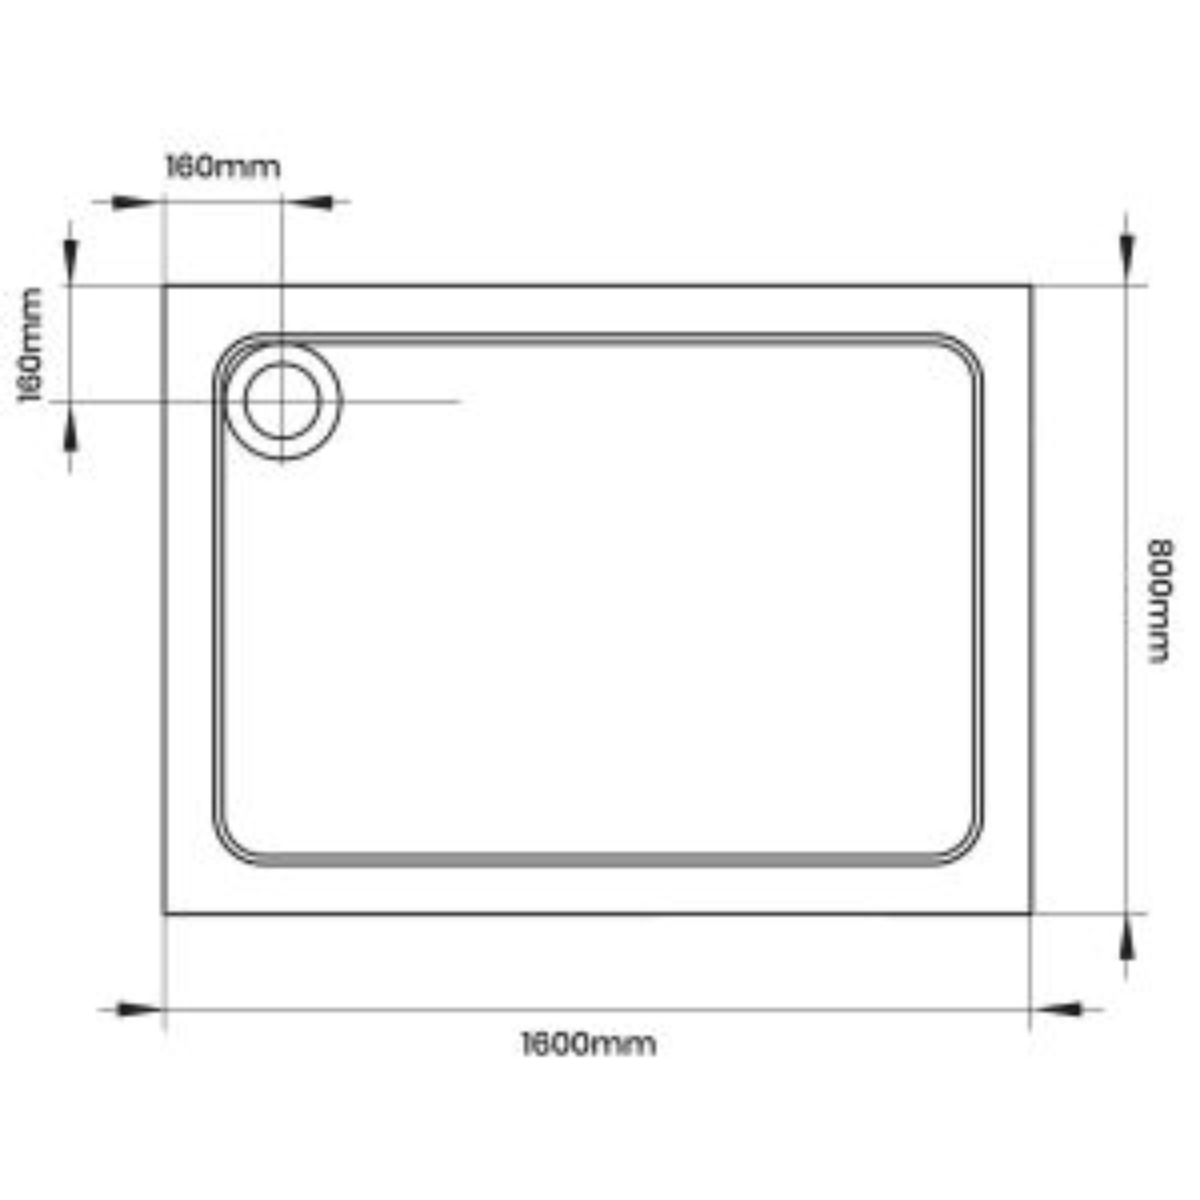 Aquadart Rectangular 1600 x 800 Shower Tray